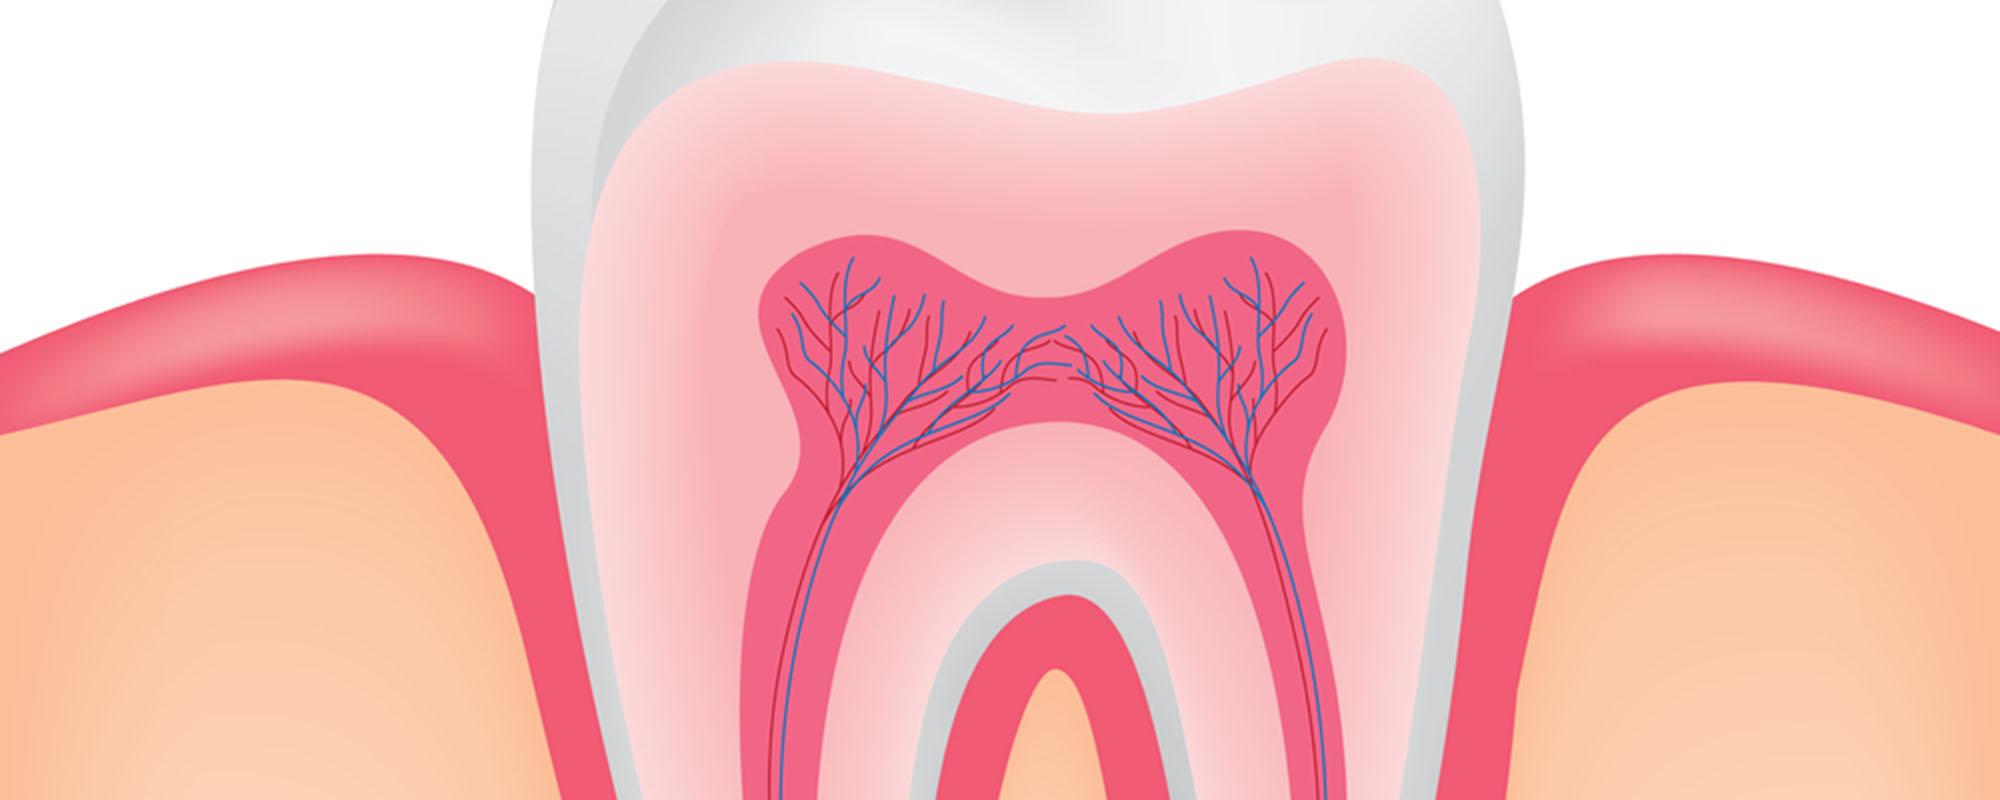 Нервы зуба